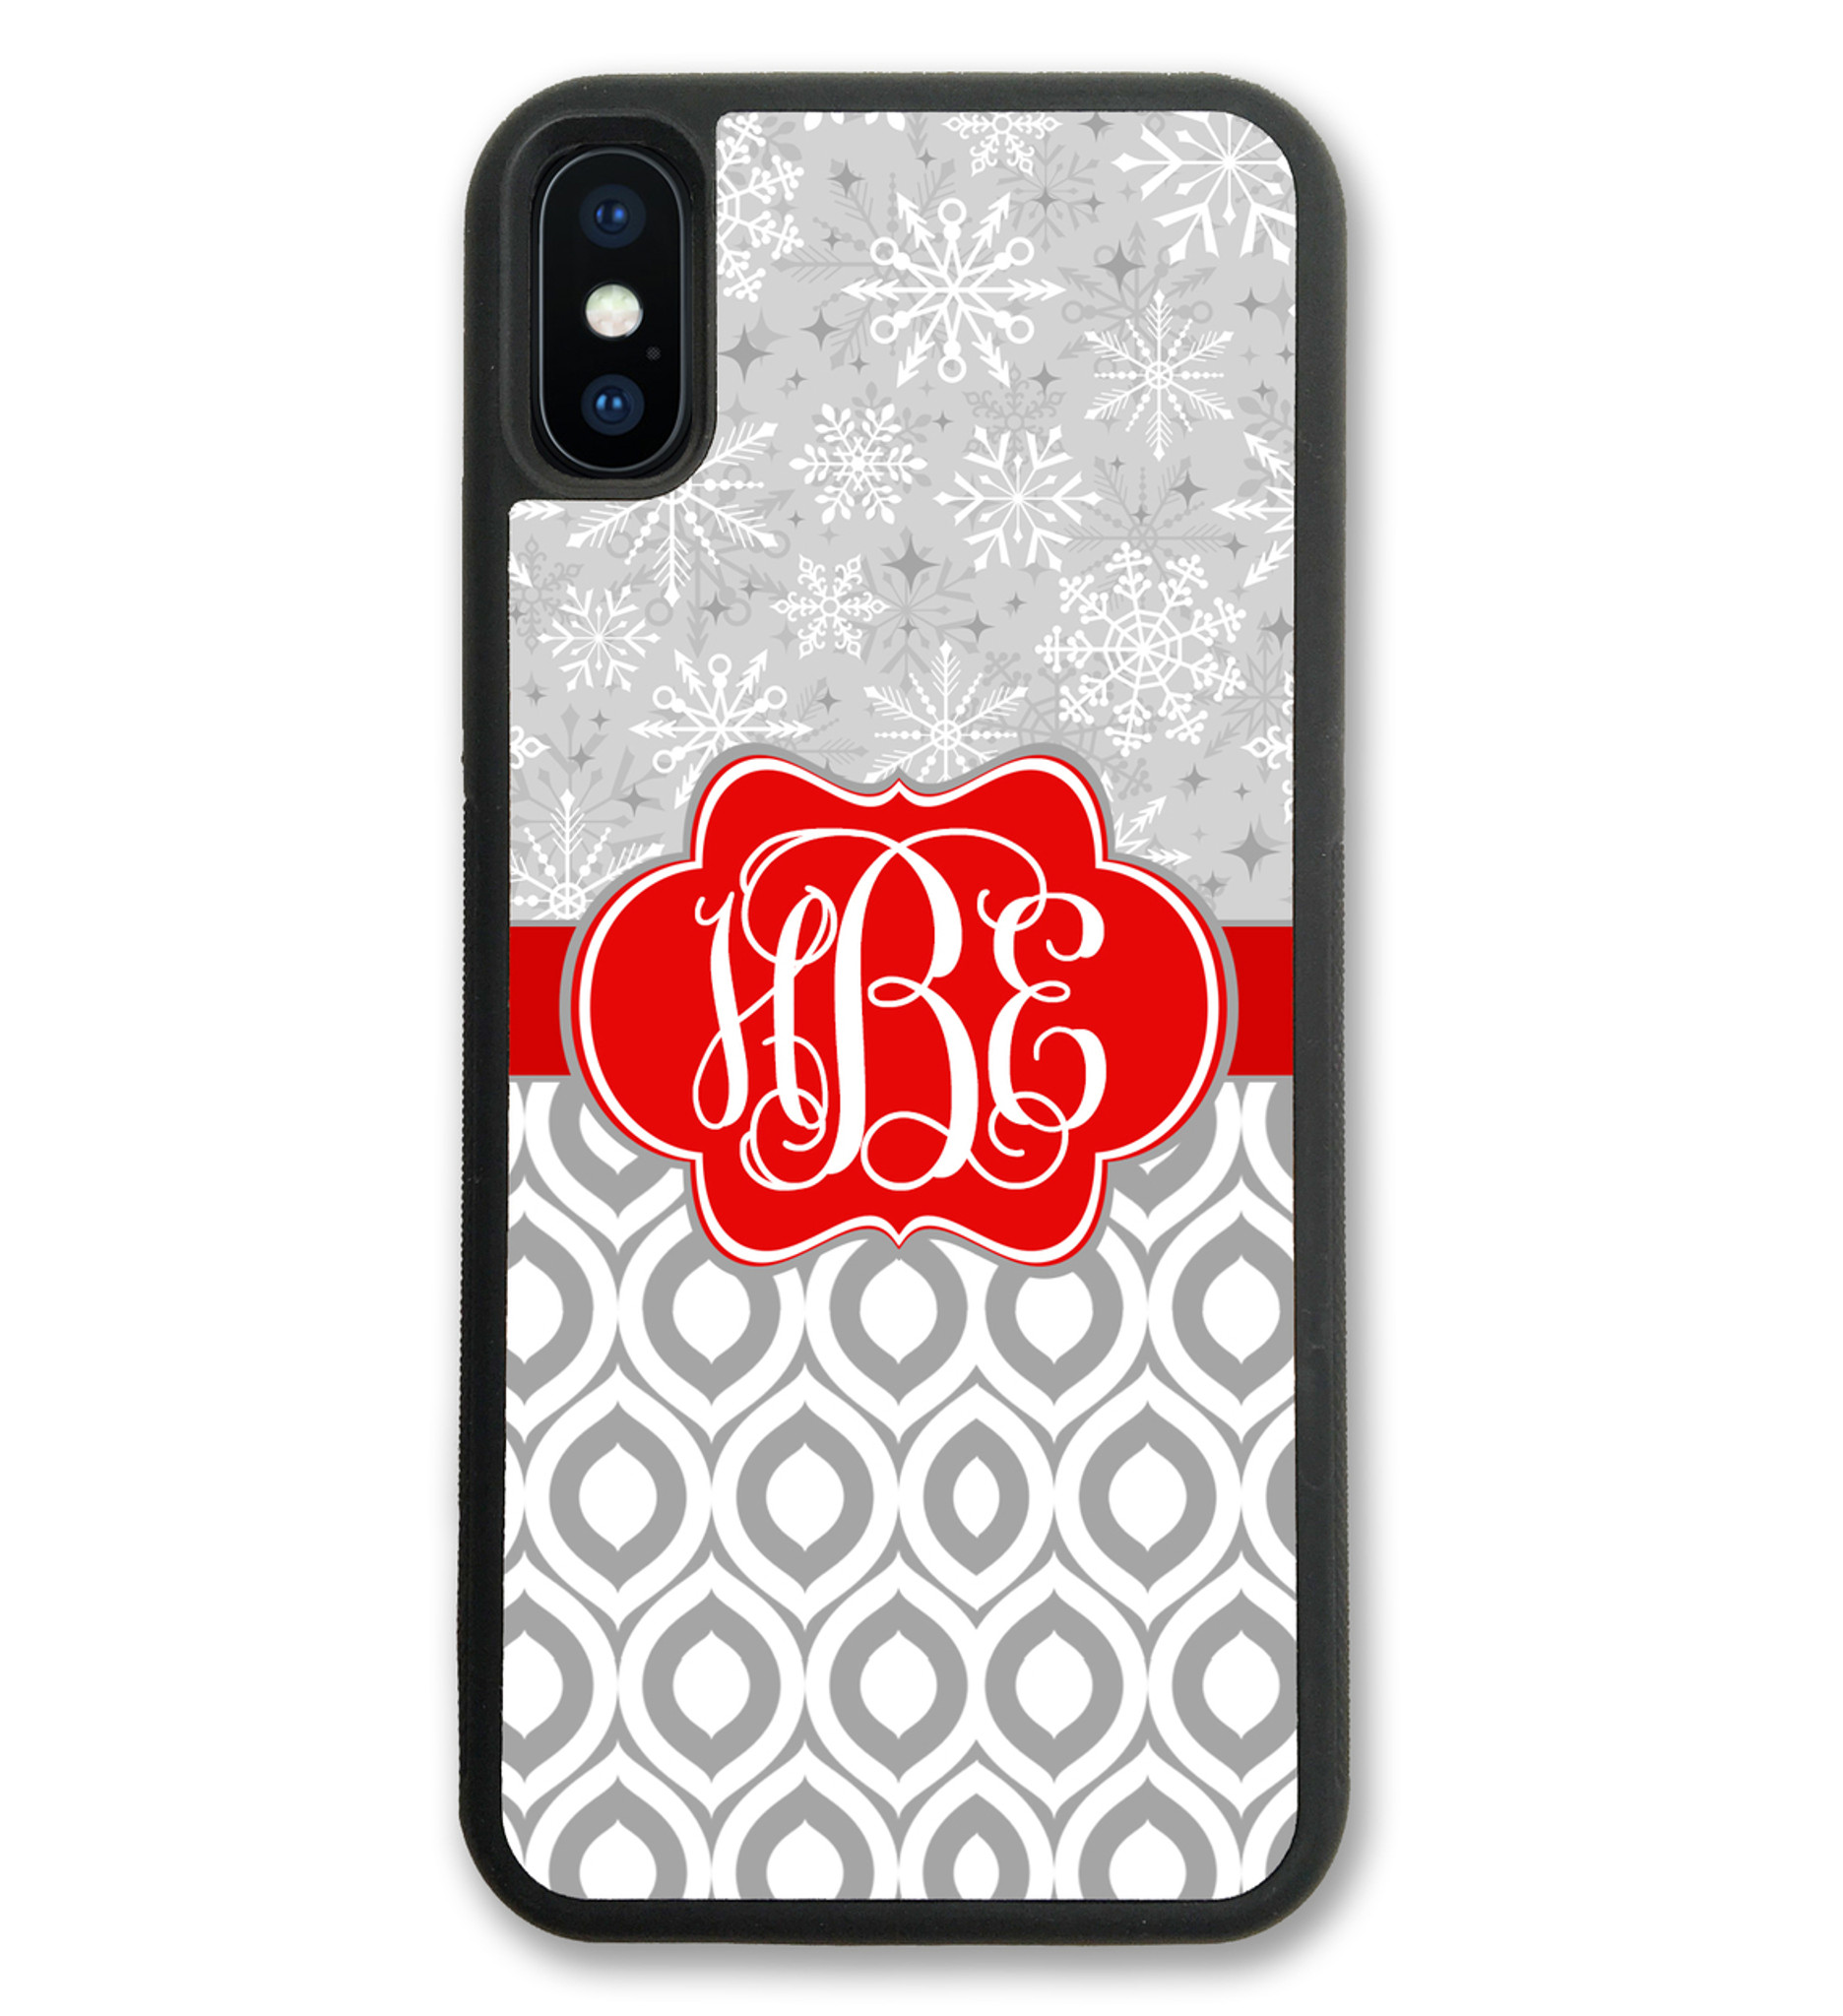 Christmas iPhone X Case, iPhone 10 Case, iPhone 8 Case, iPhone 8 ...